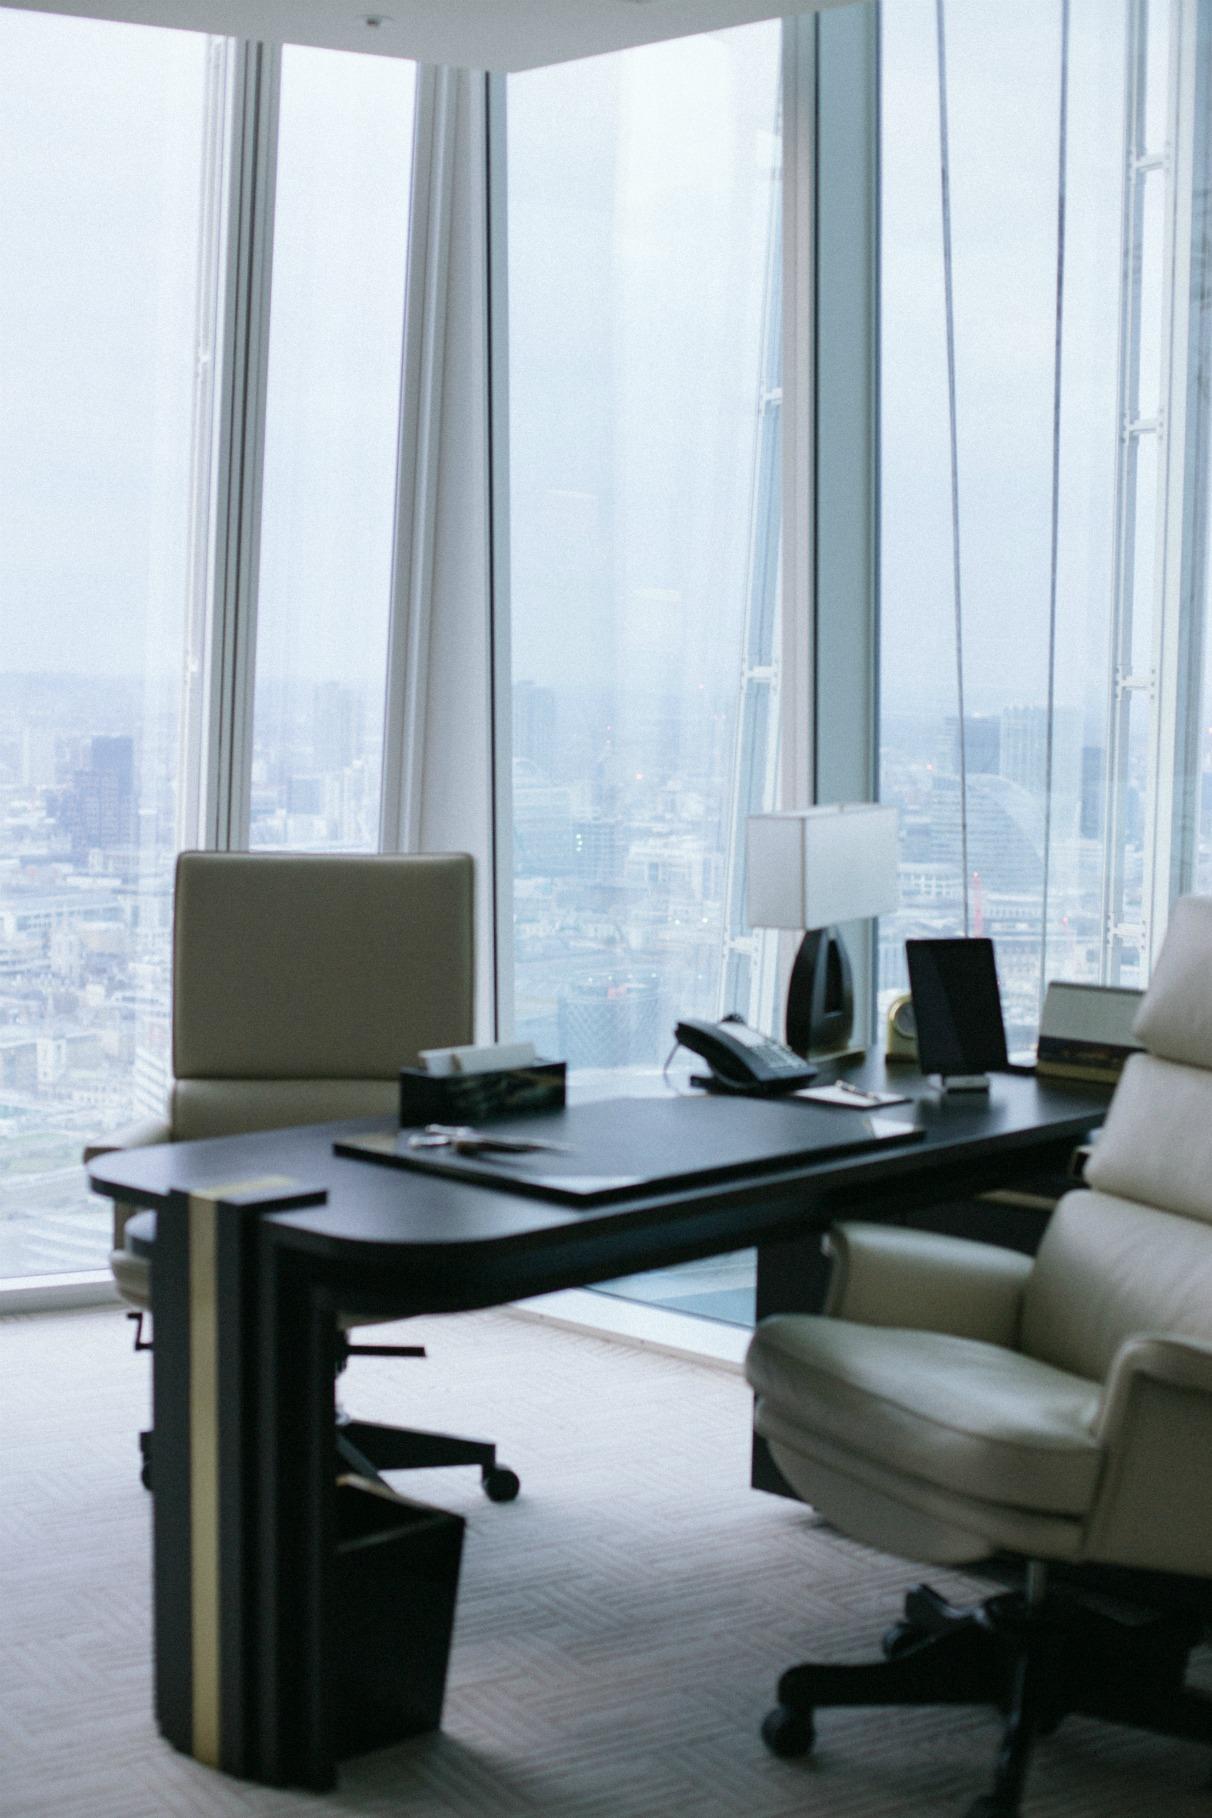 disi-couture-travel-shangri-la-hotel-shard-london-tower-bridge-england-edisa-shahini-11